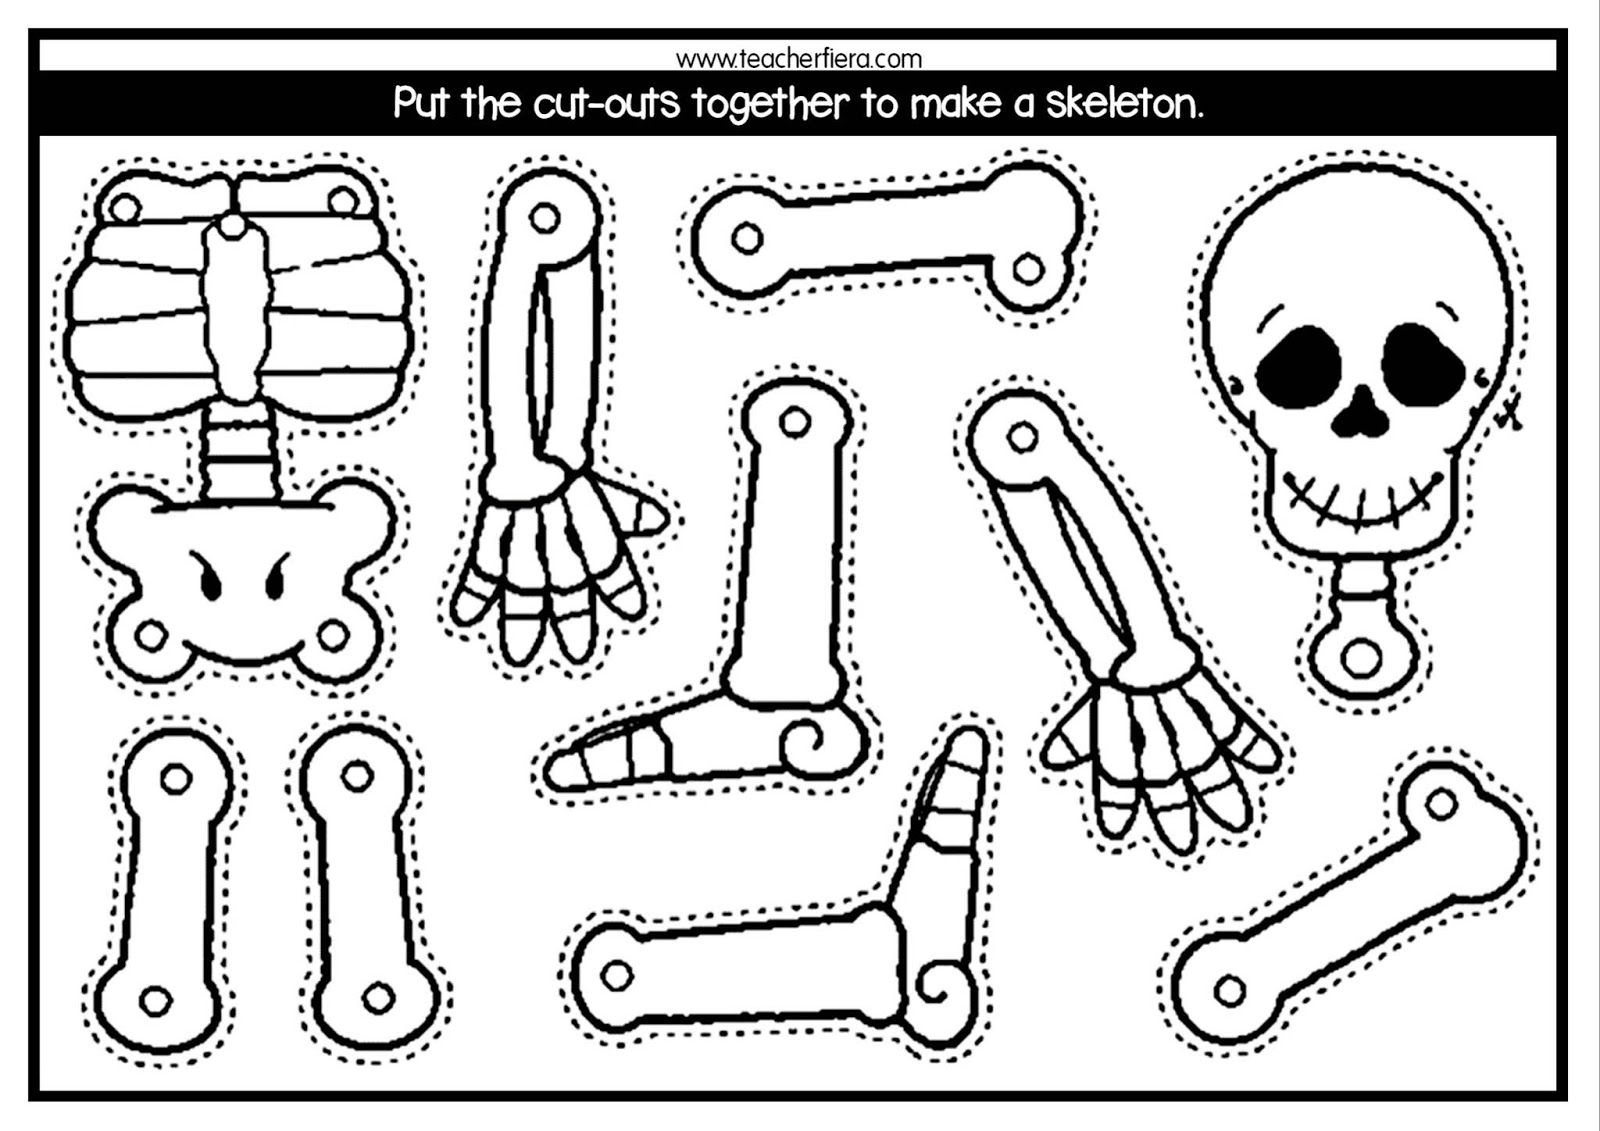 Build A Skeleton Worksheet   Printable Worksheets and Activities for  Teachers [ 1131 x 1600 Pixel ]